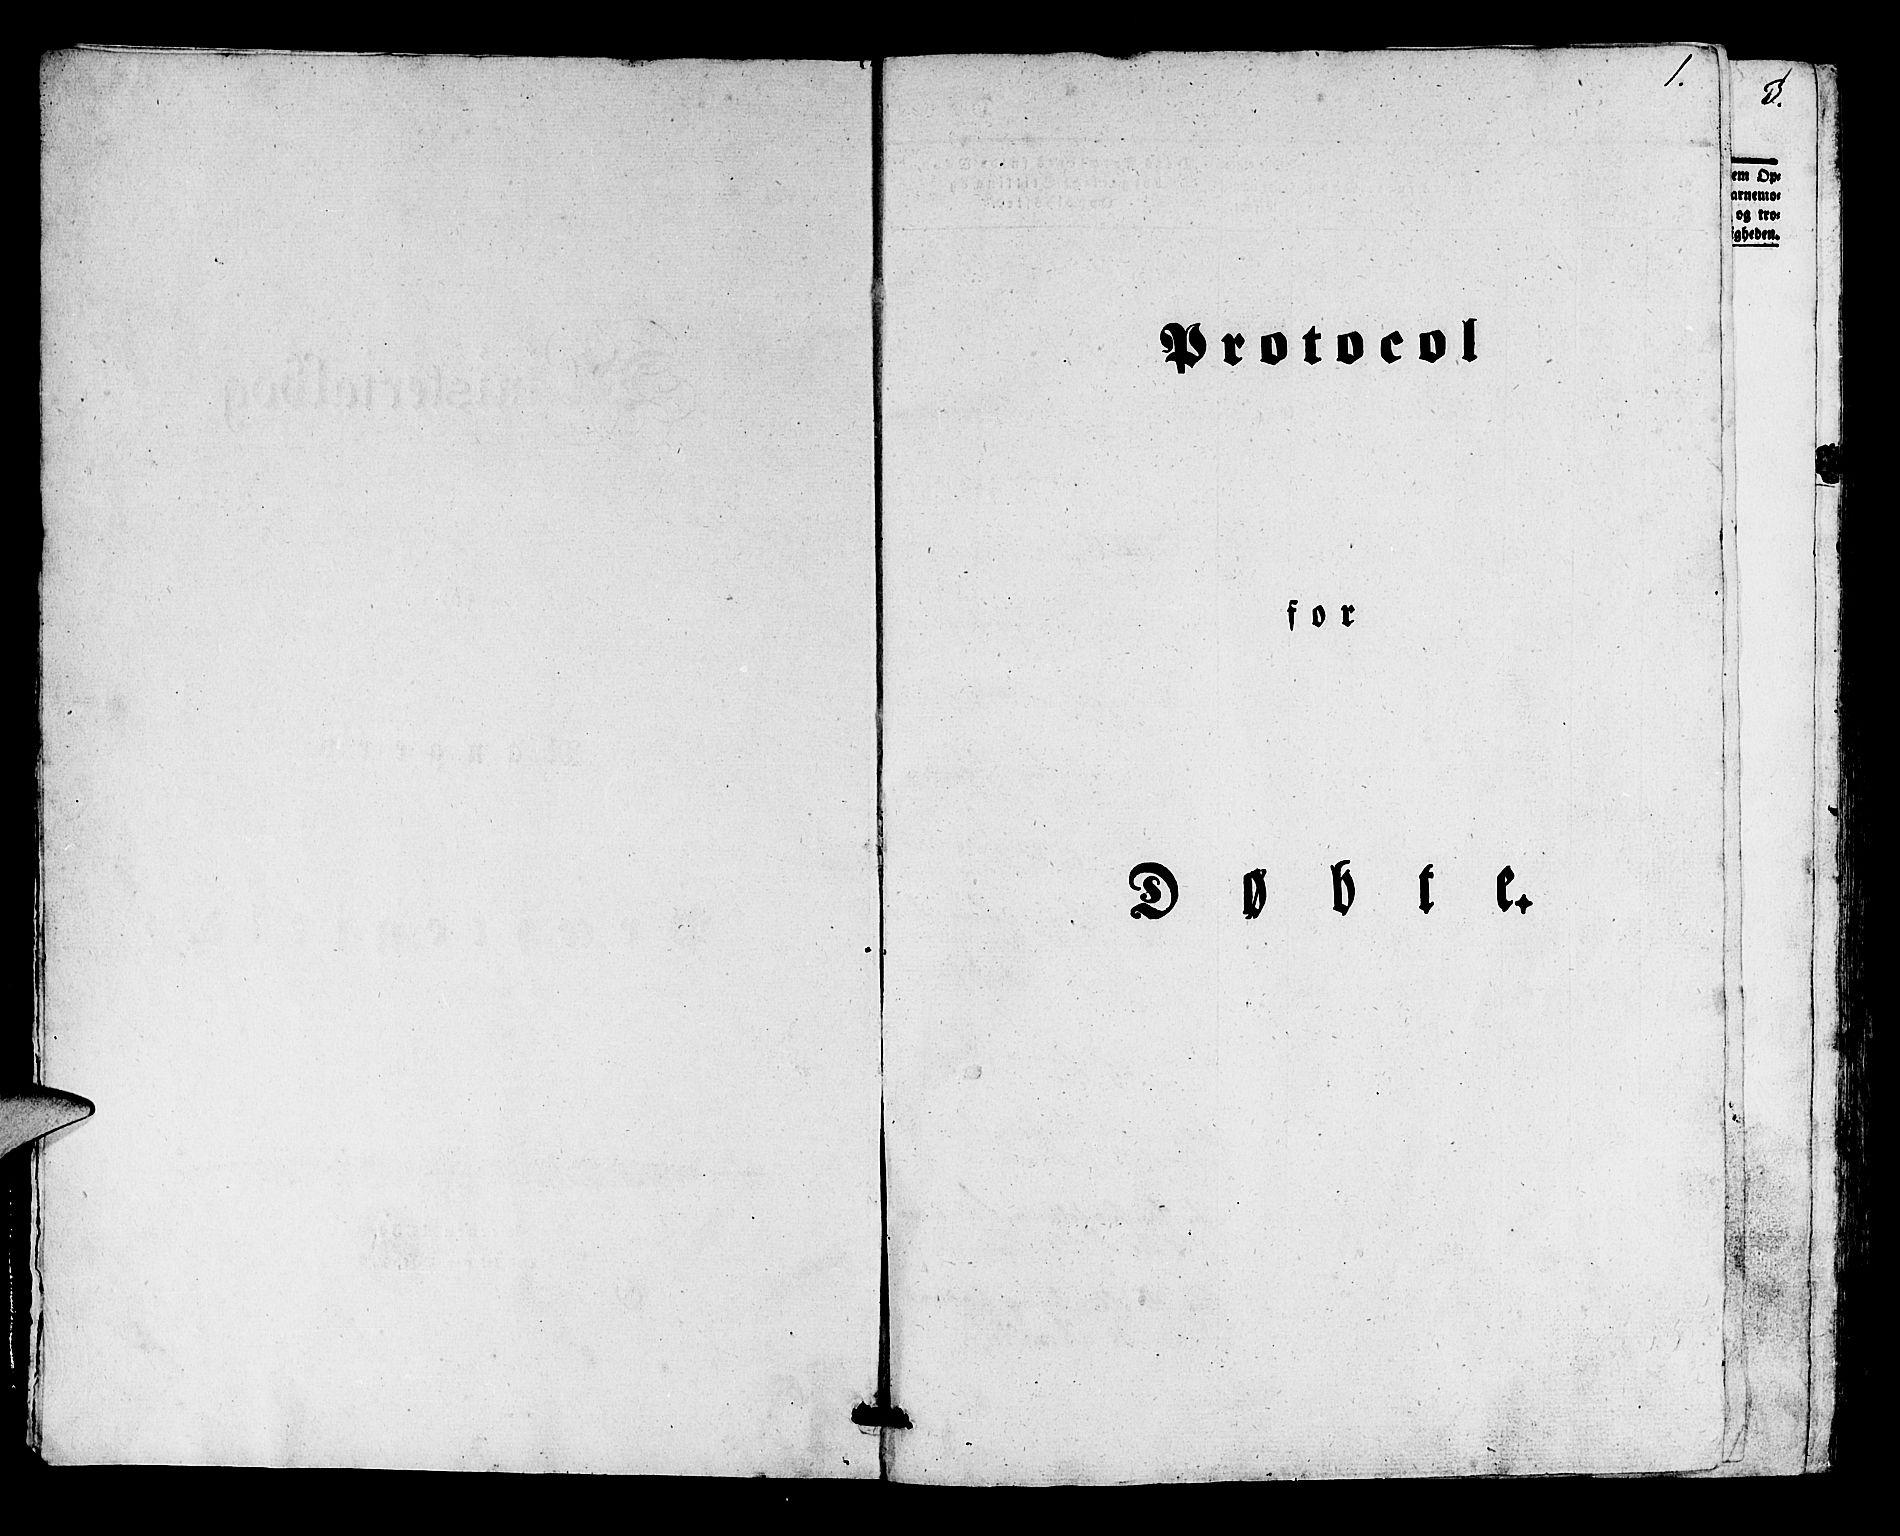 SAB, Manger sokneprestembete, H/Haa: Ministerialbok nr. A 5, 1839-1848, s. 1